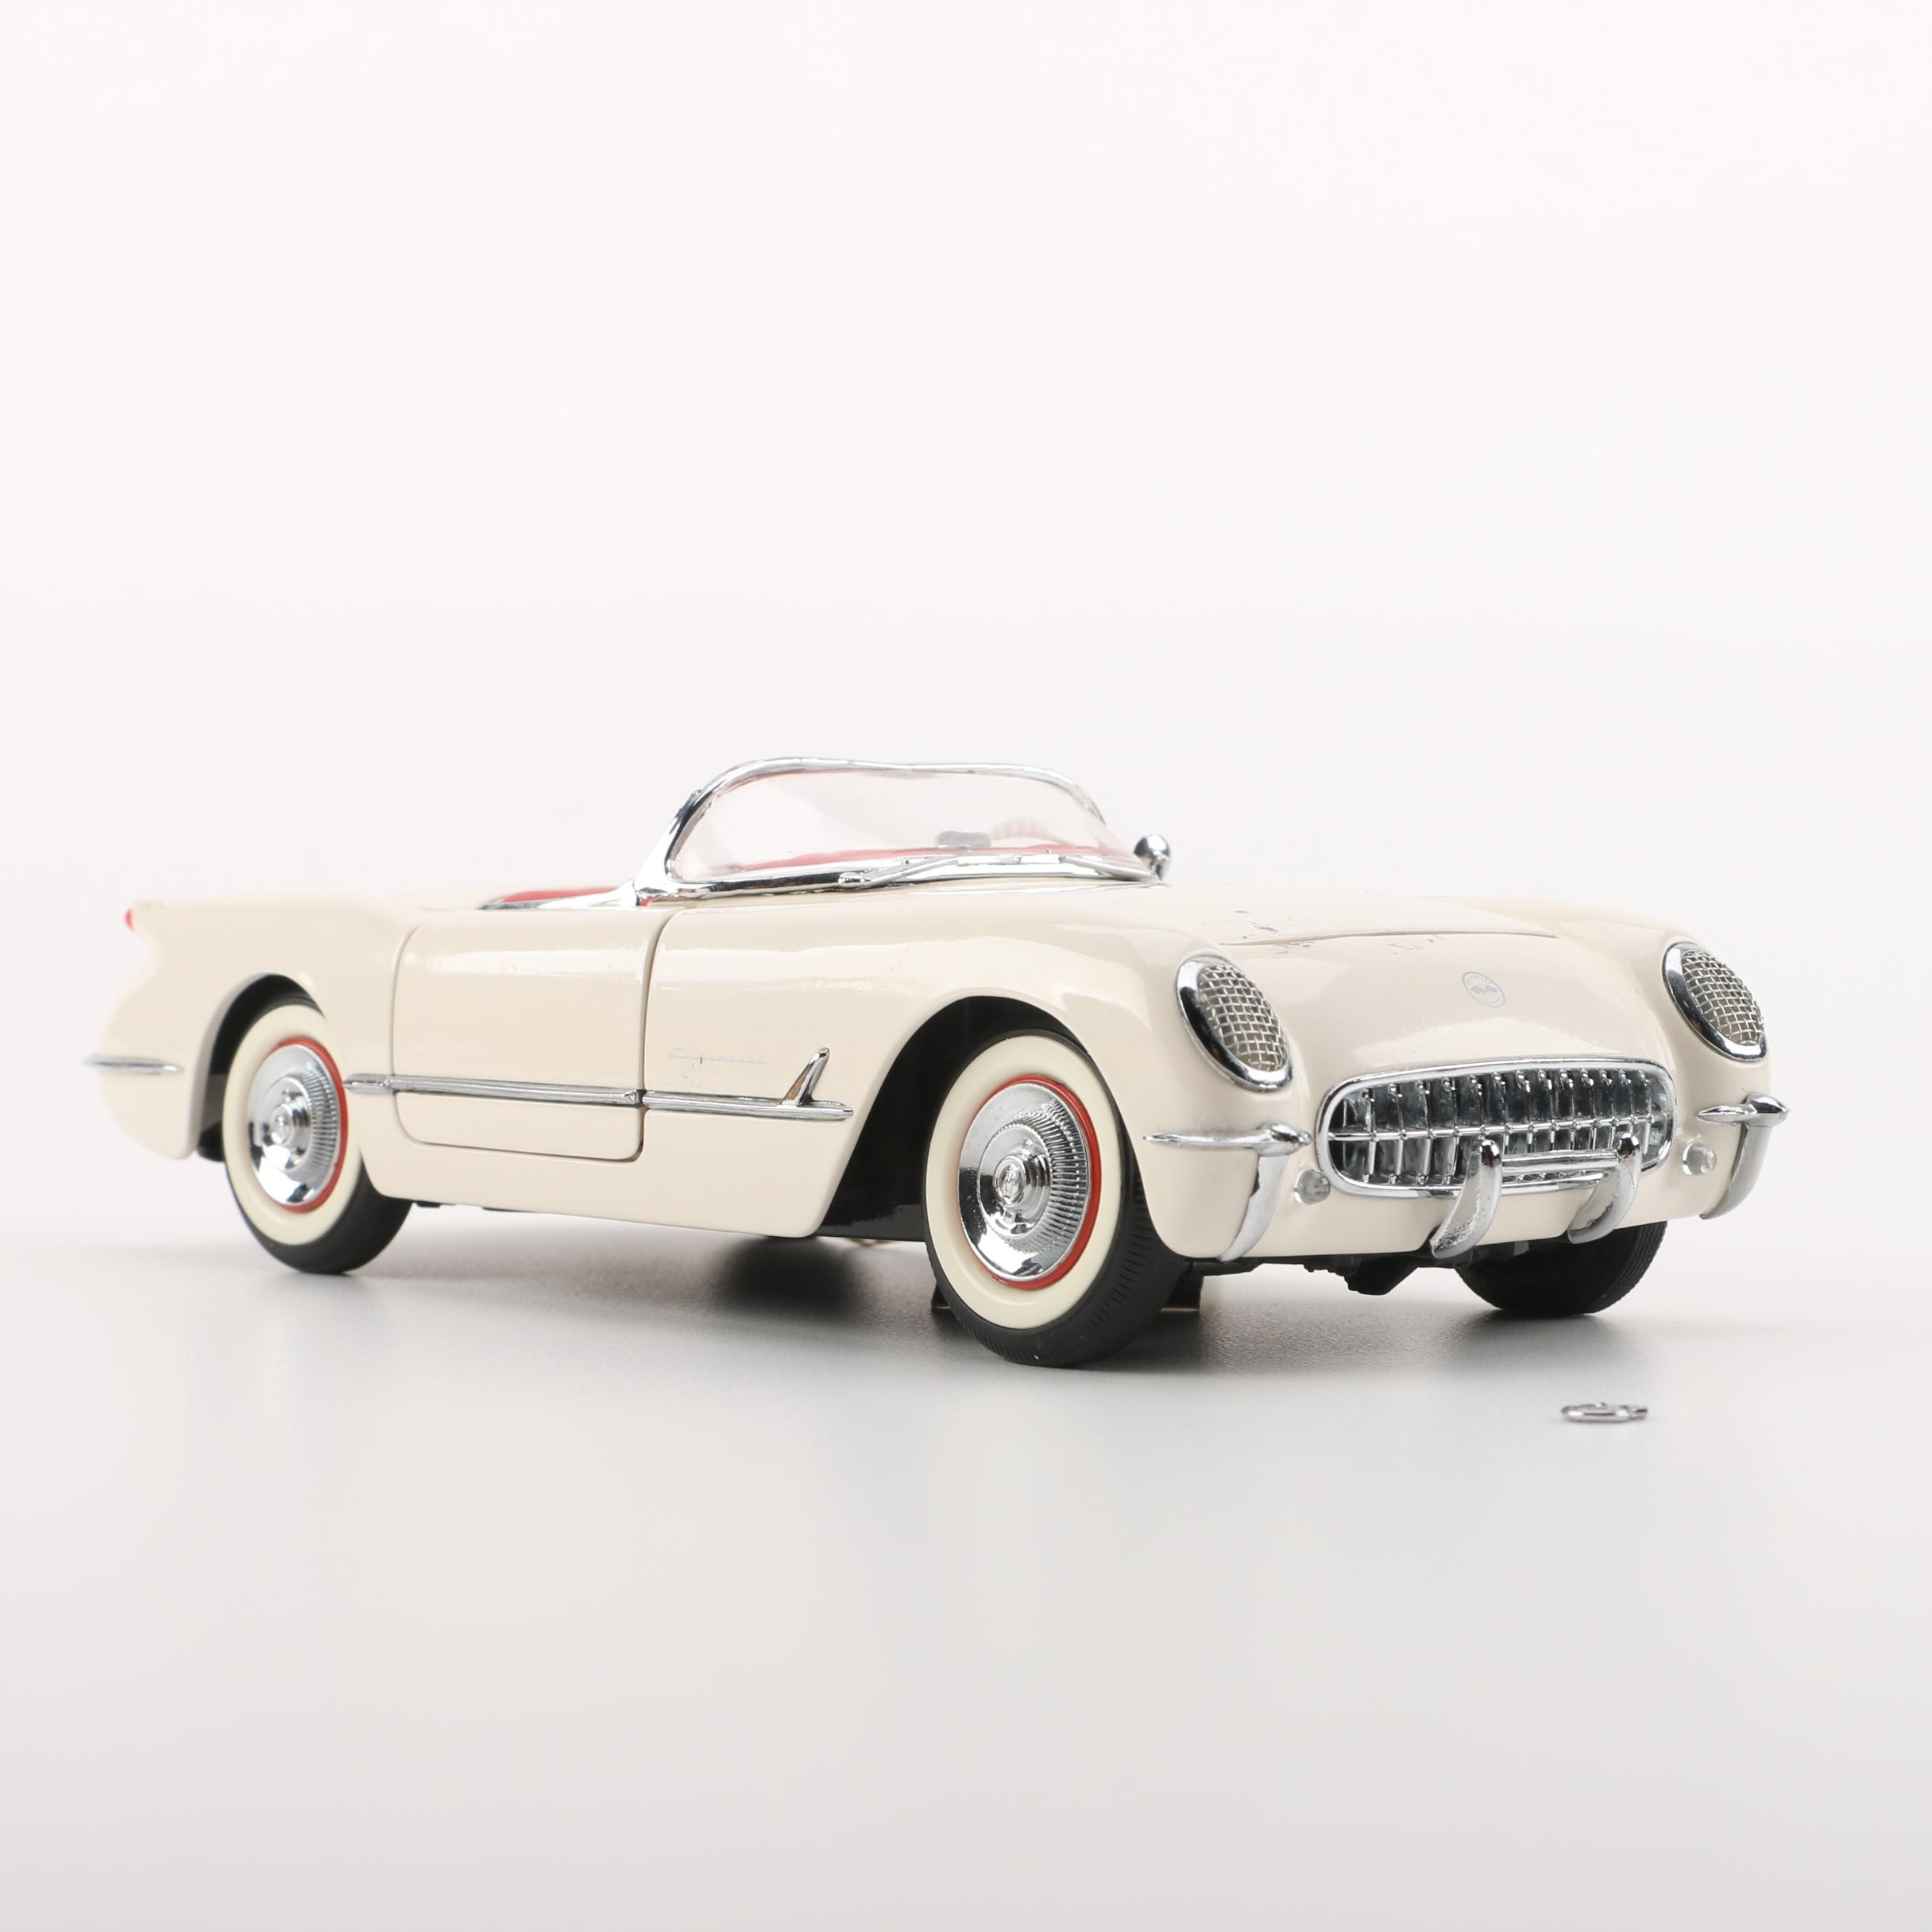 1953 Corvette Roadster Die-Cast Car by Franklin Mint Precision Models